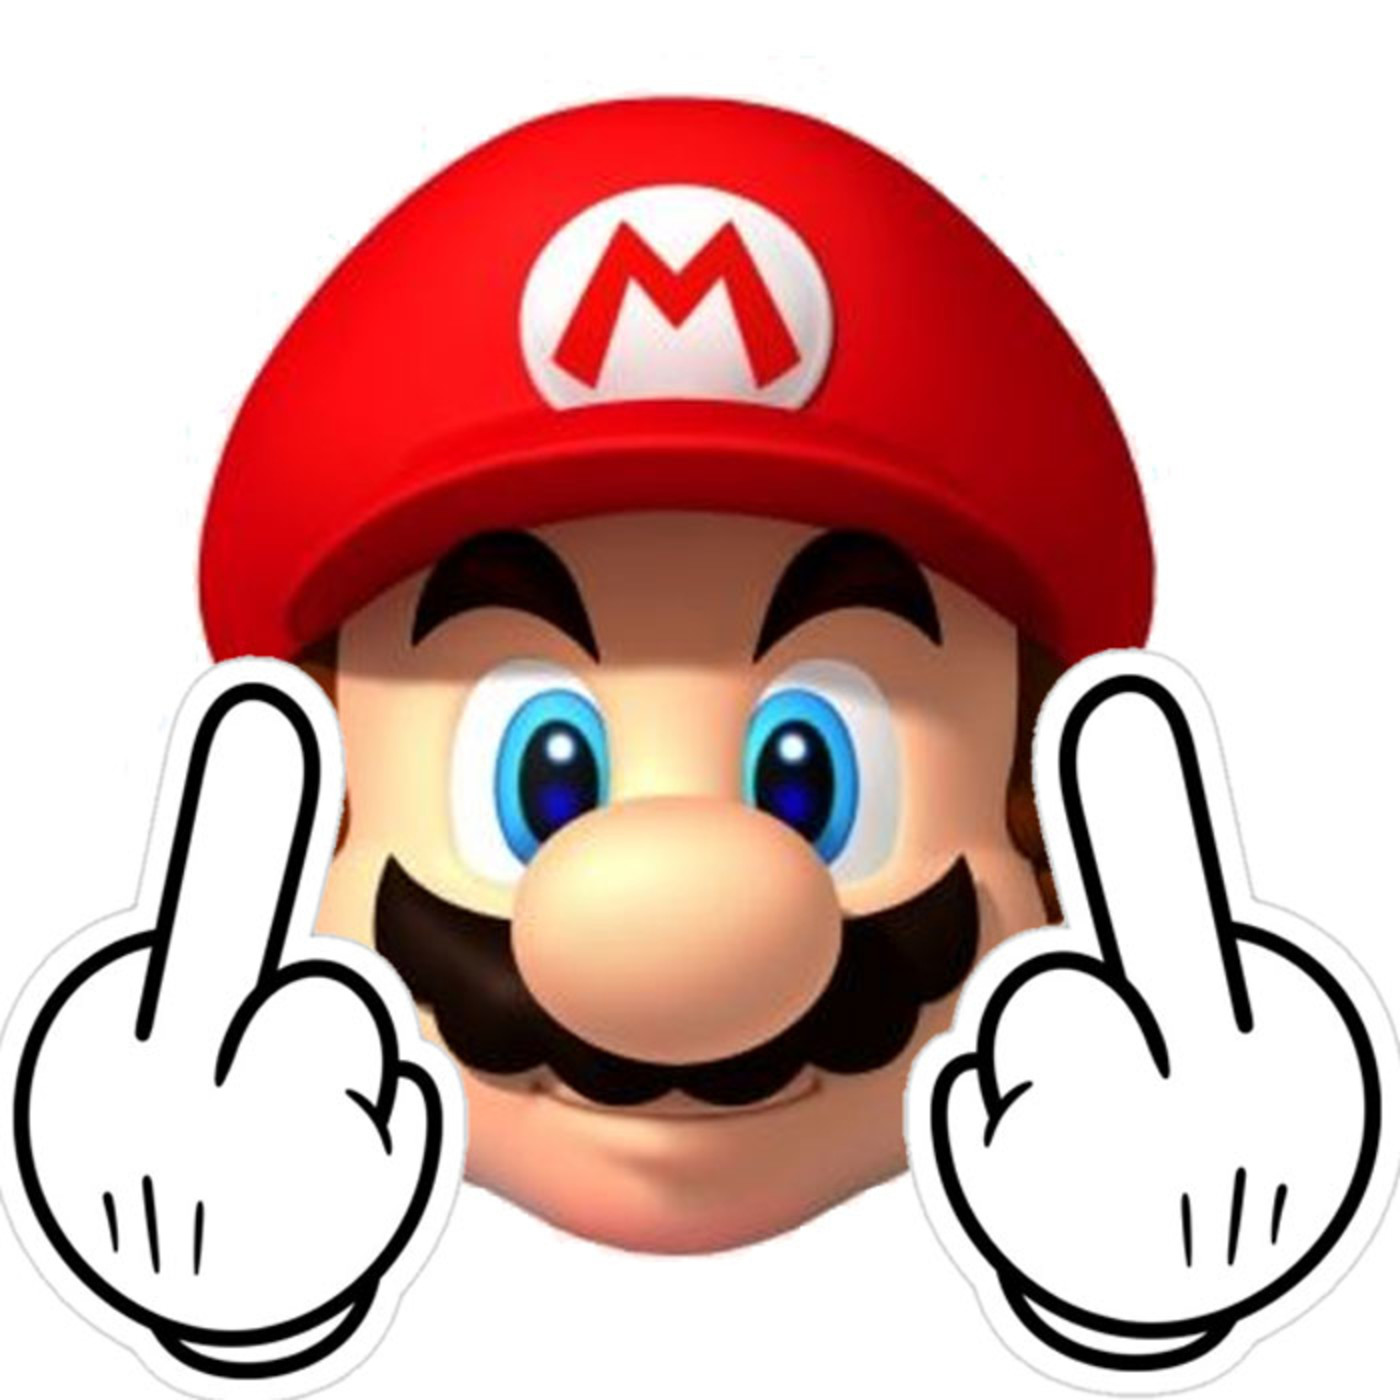 La verdad oculta de Nintendo - Lágrimas en la lluvia S02E5